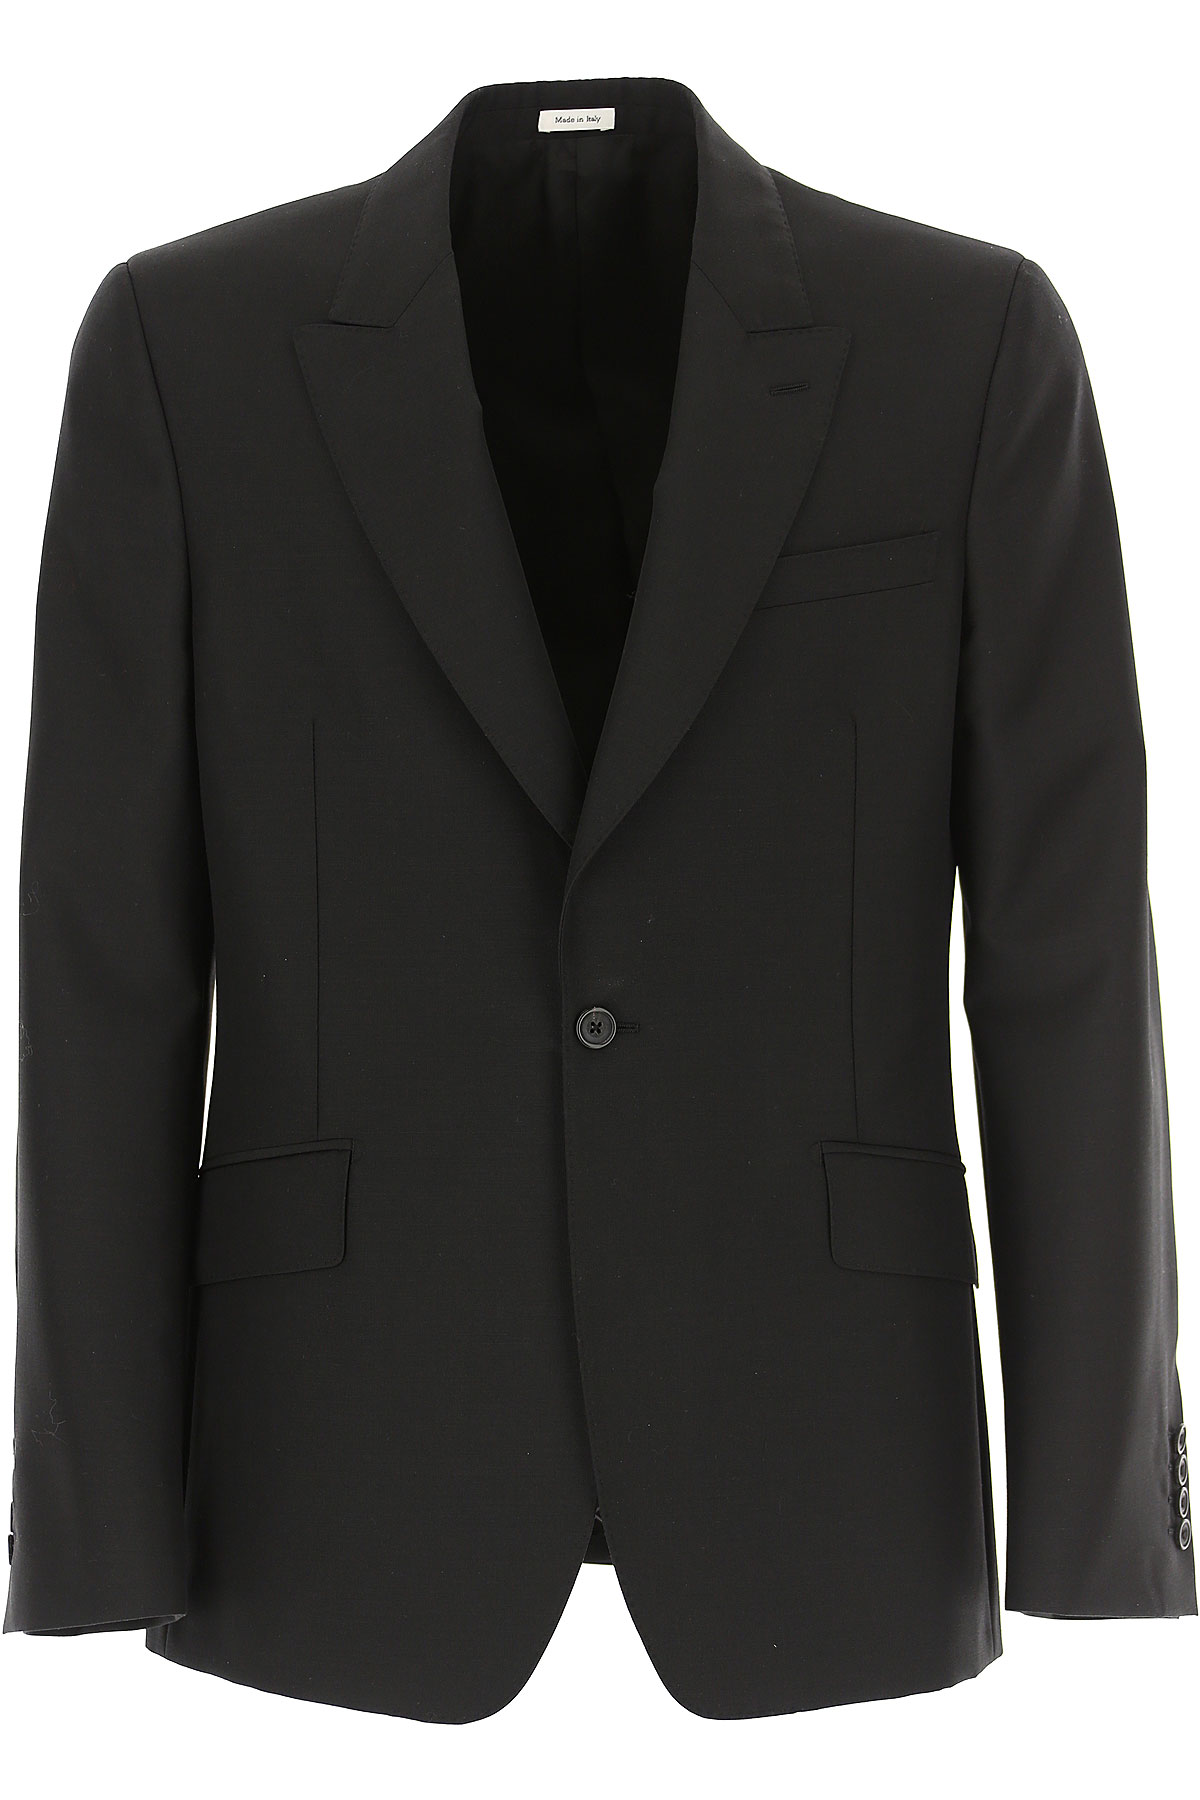 Alexander McQueen Blazer for Men, Sport Coat On Sale, Black, Wool, 2019, L M